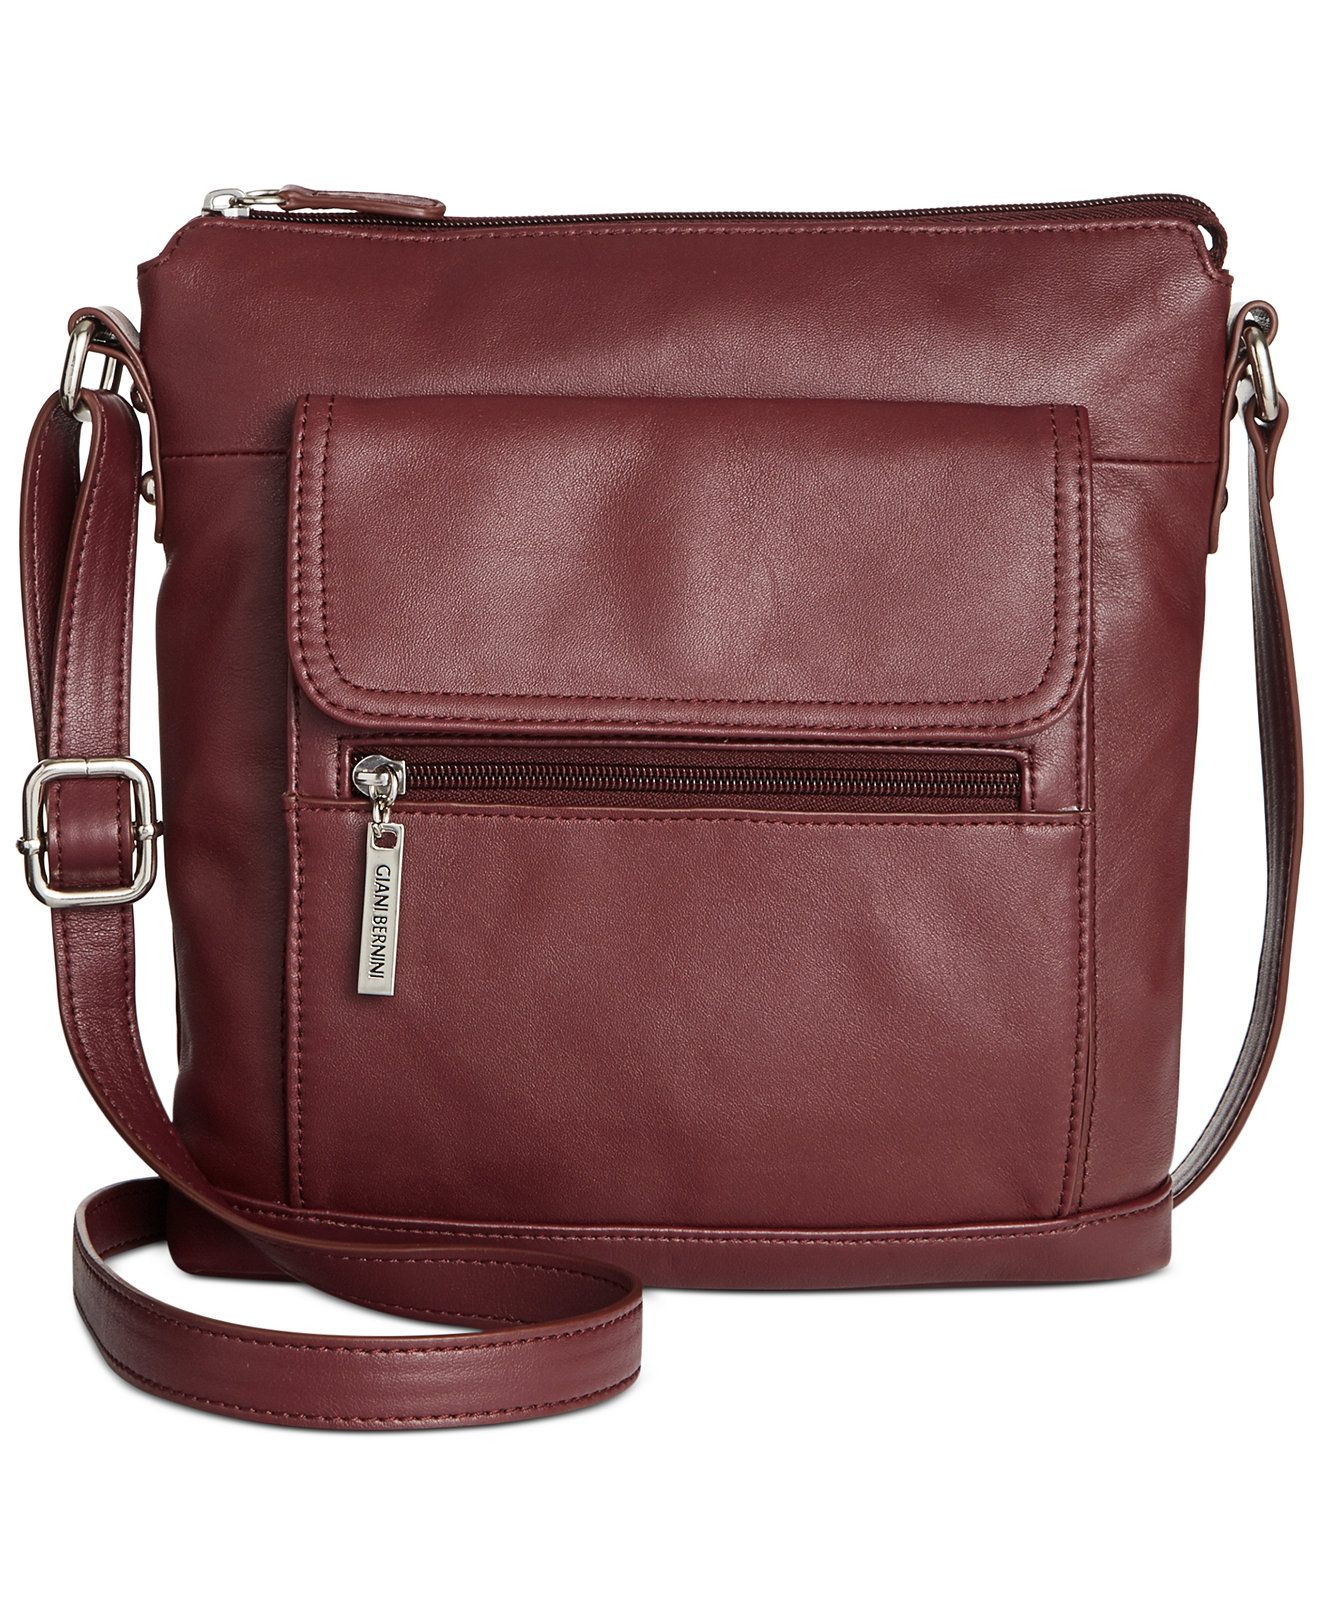 696187fe3f Giani Bernini Nappa Leather Venice Crossbody - Sale & Clearance - Handbags  & Accessories - Macy's